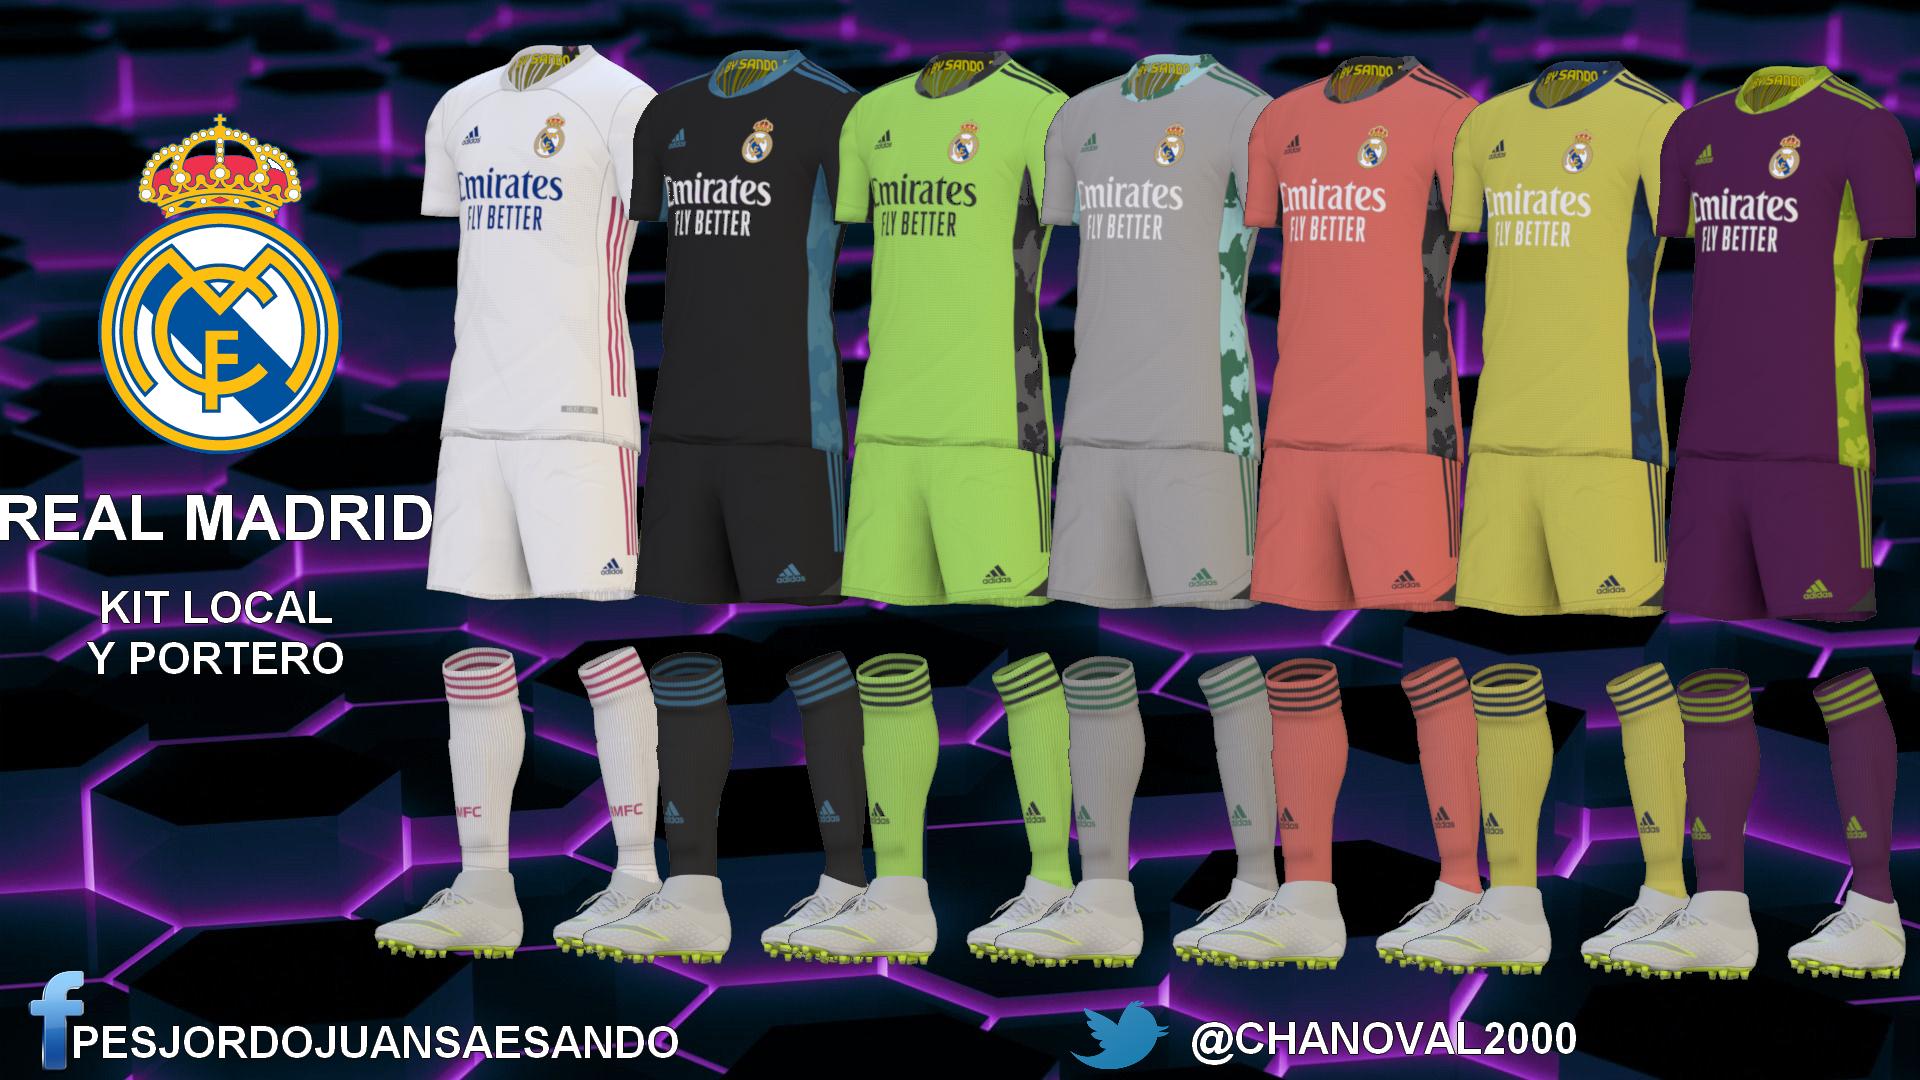 Kits Real Madrid 2020/2021 by Sando